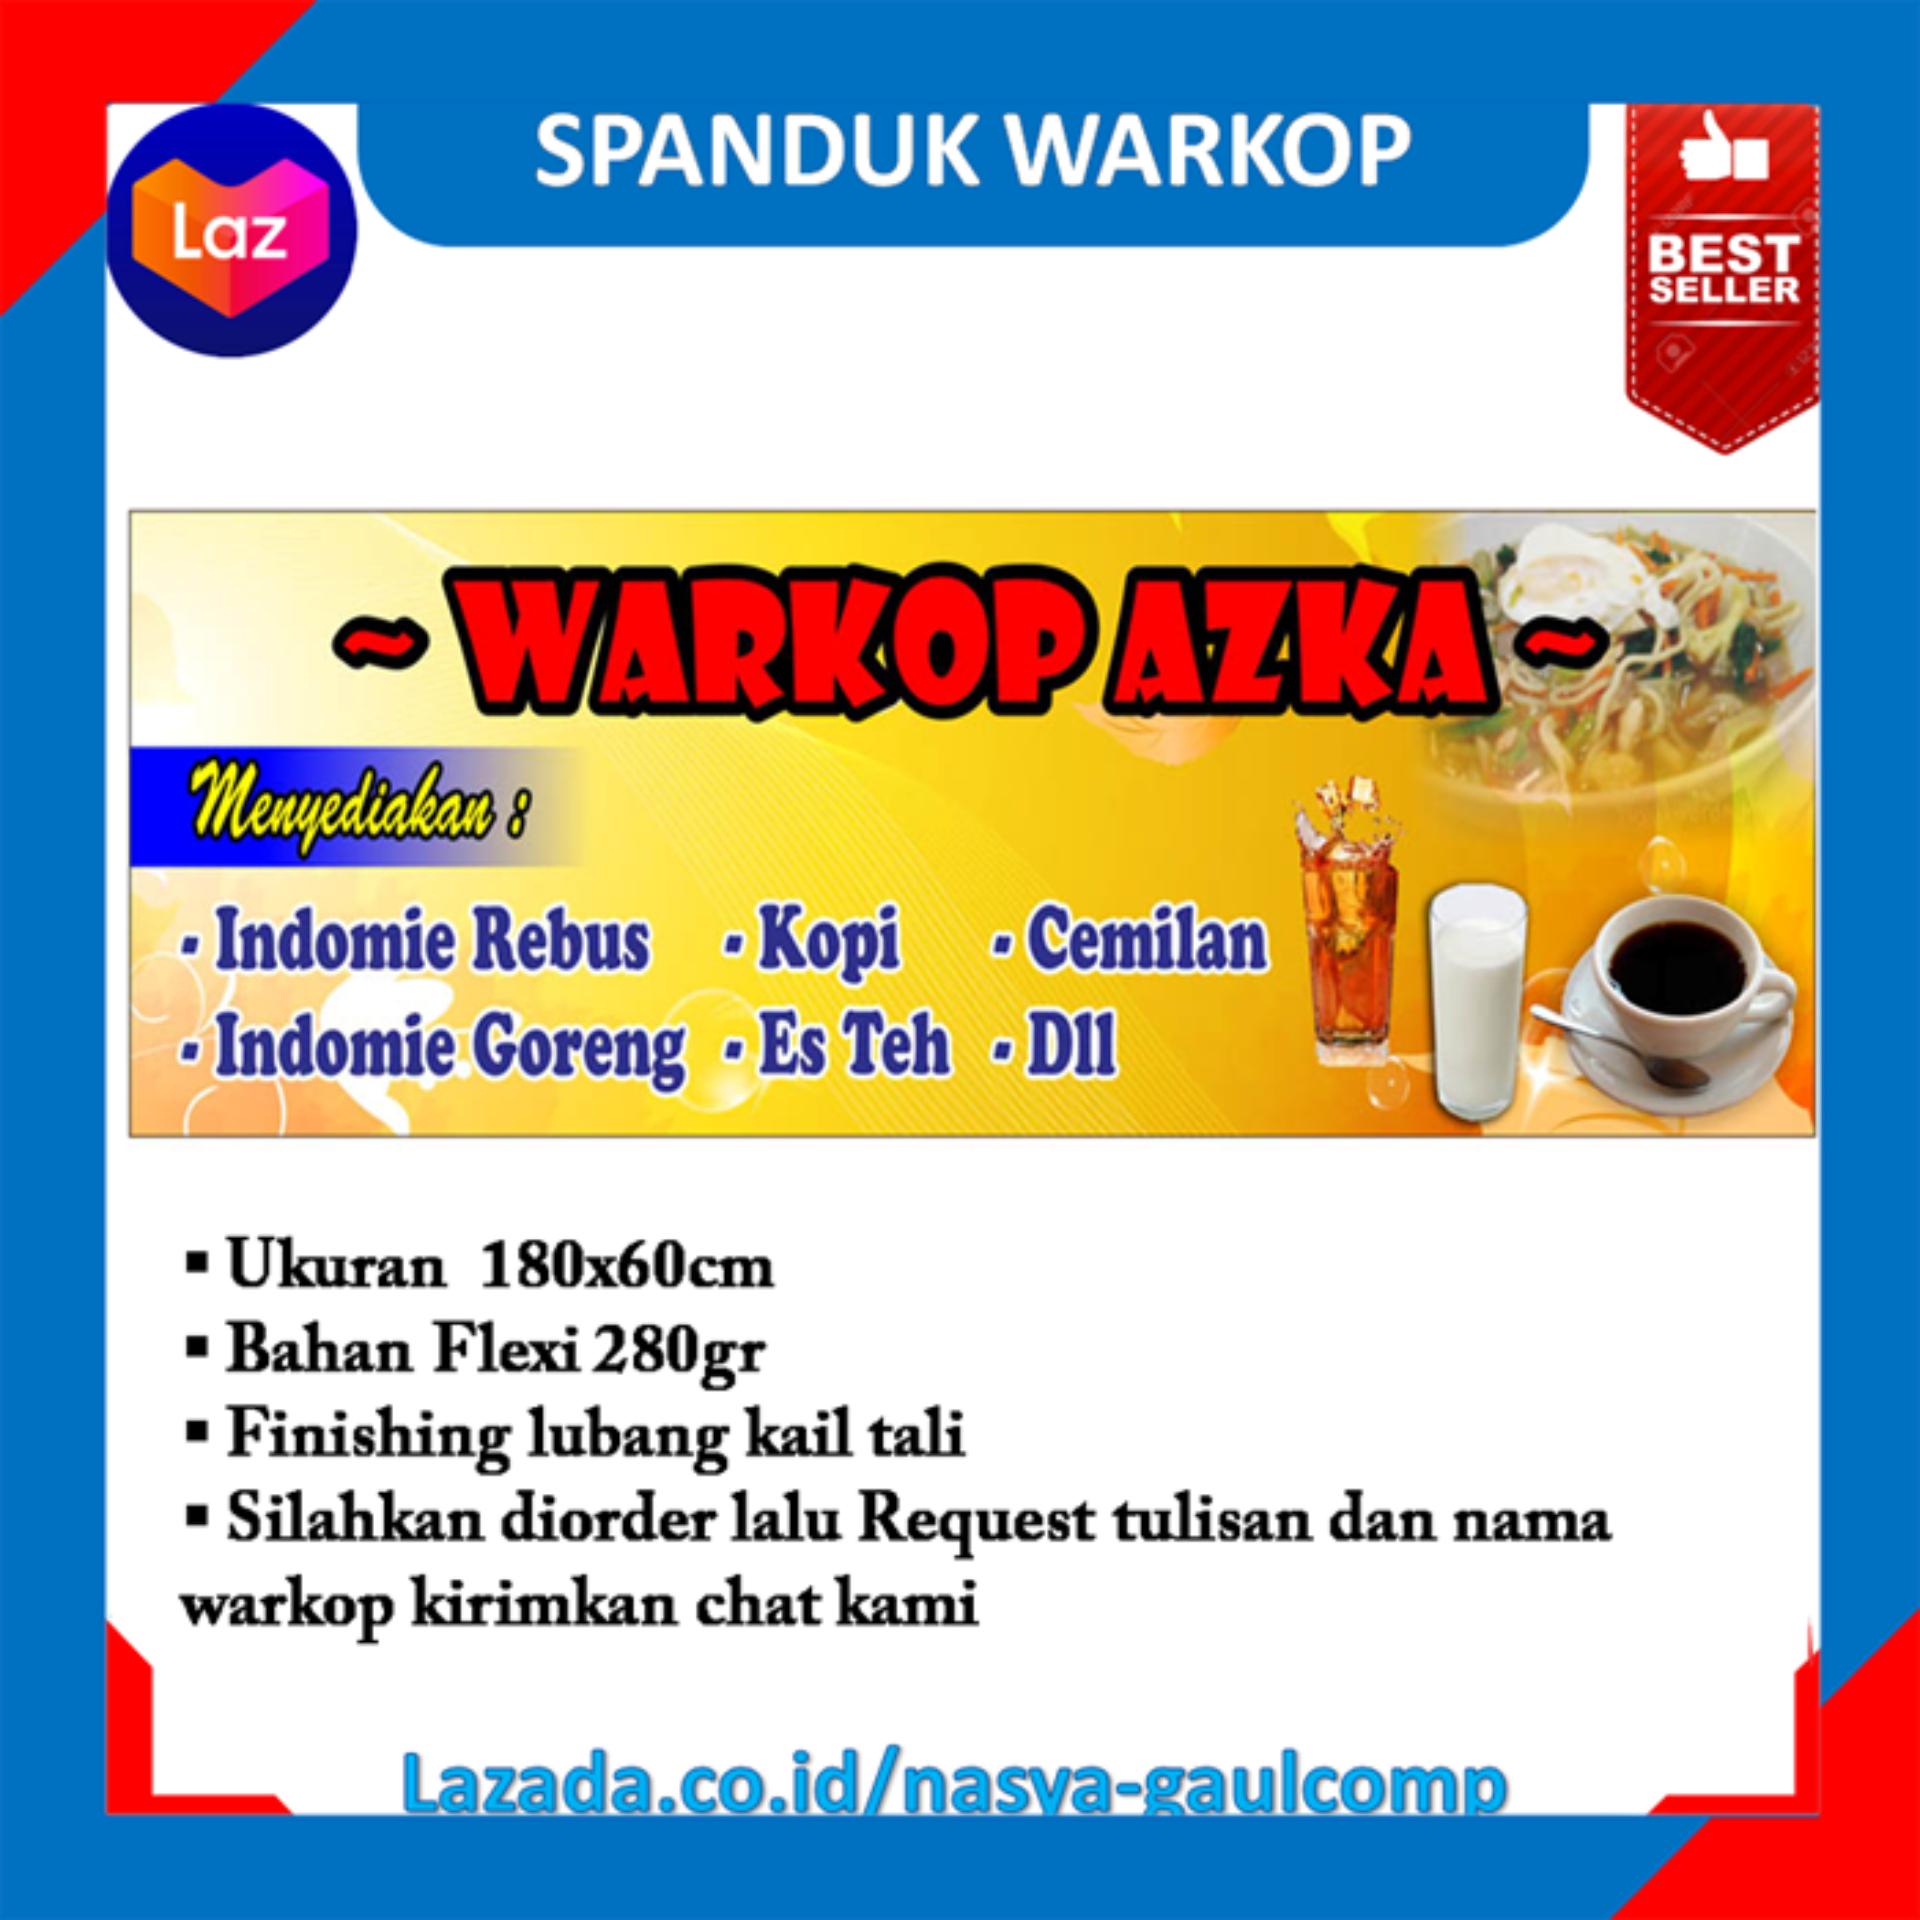 Contoh Gambar Spanduk Warkop - desain spanduk keren